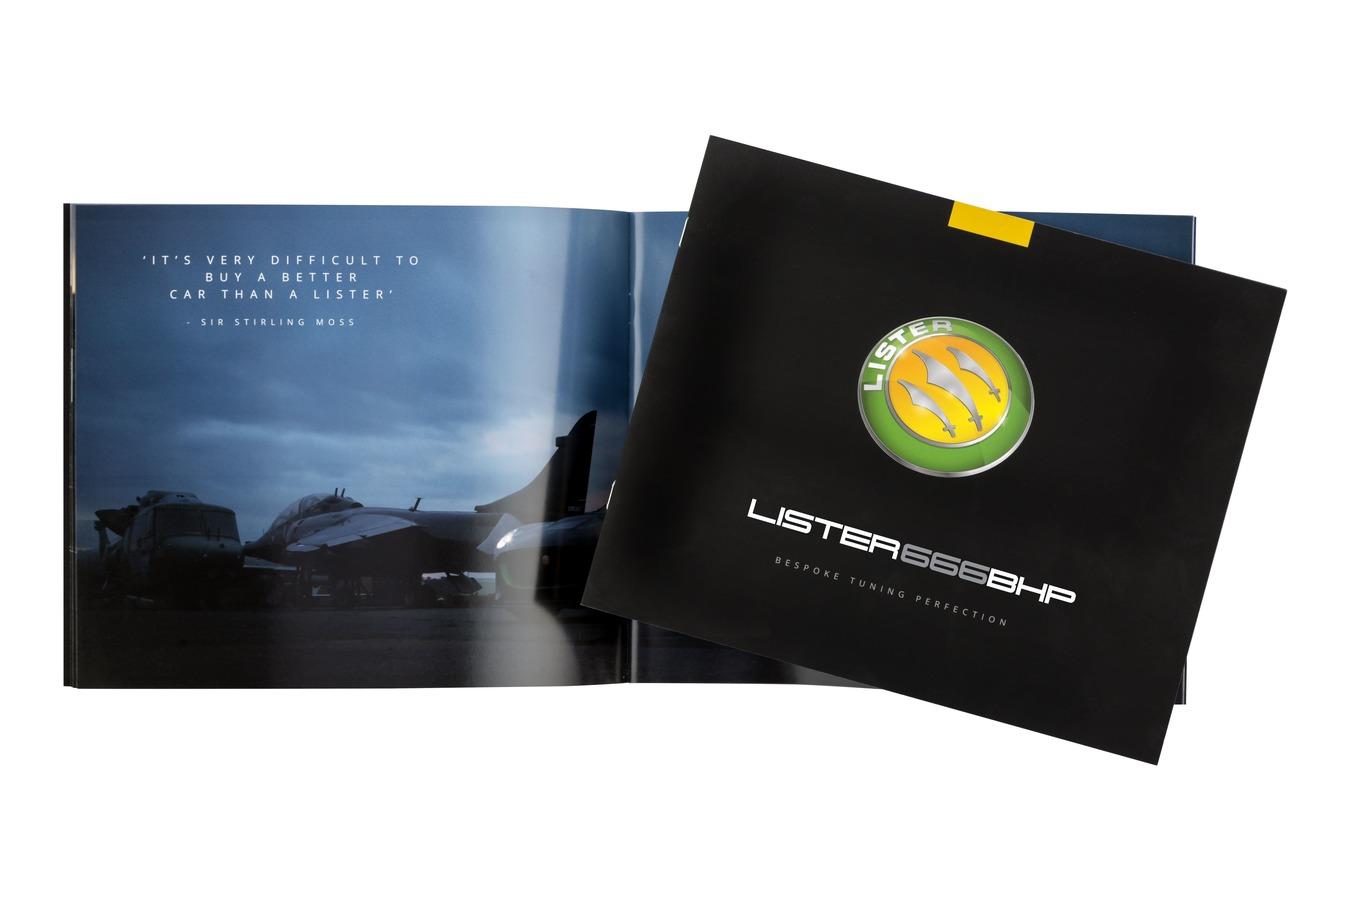 Lister 666bhp Brochure